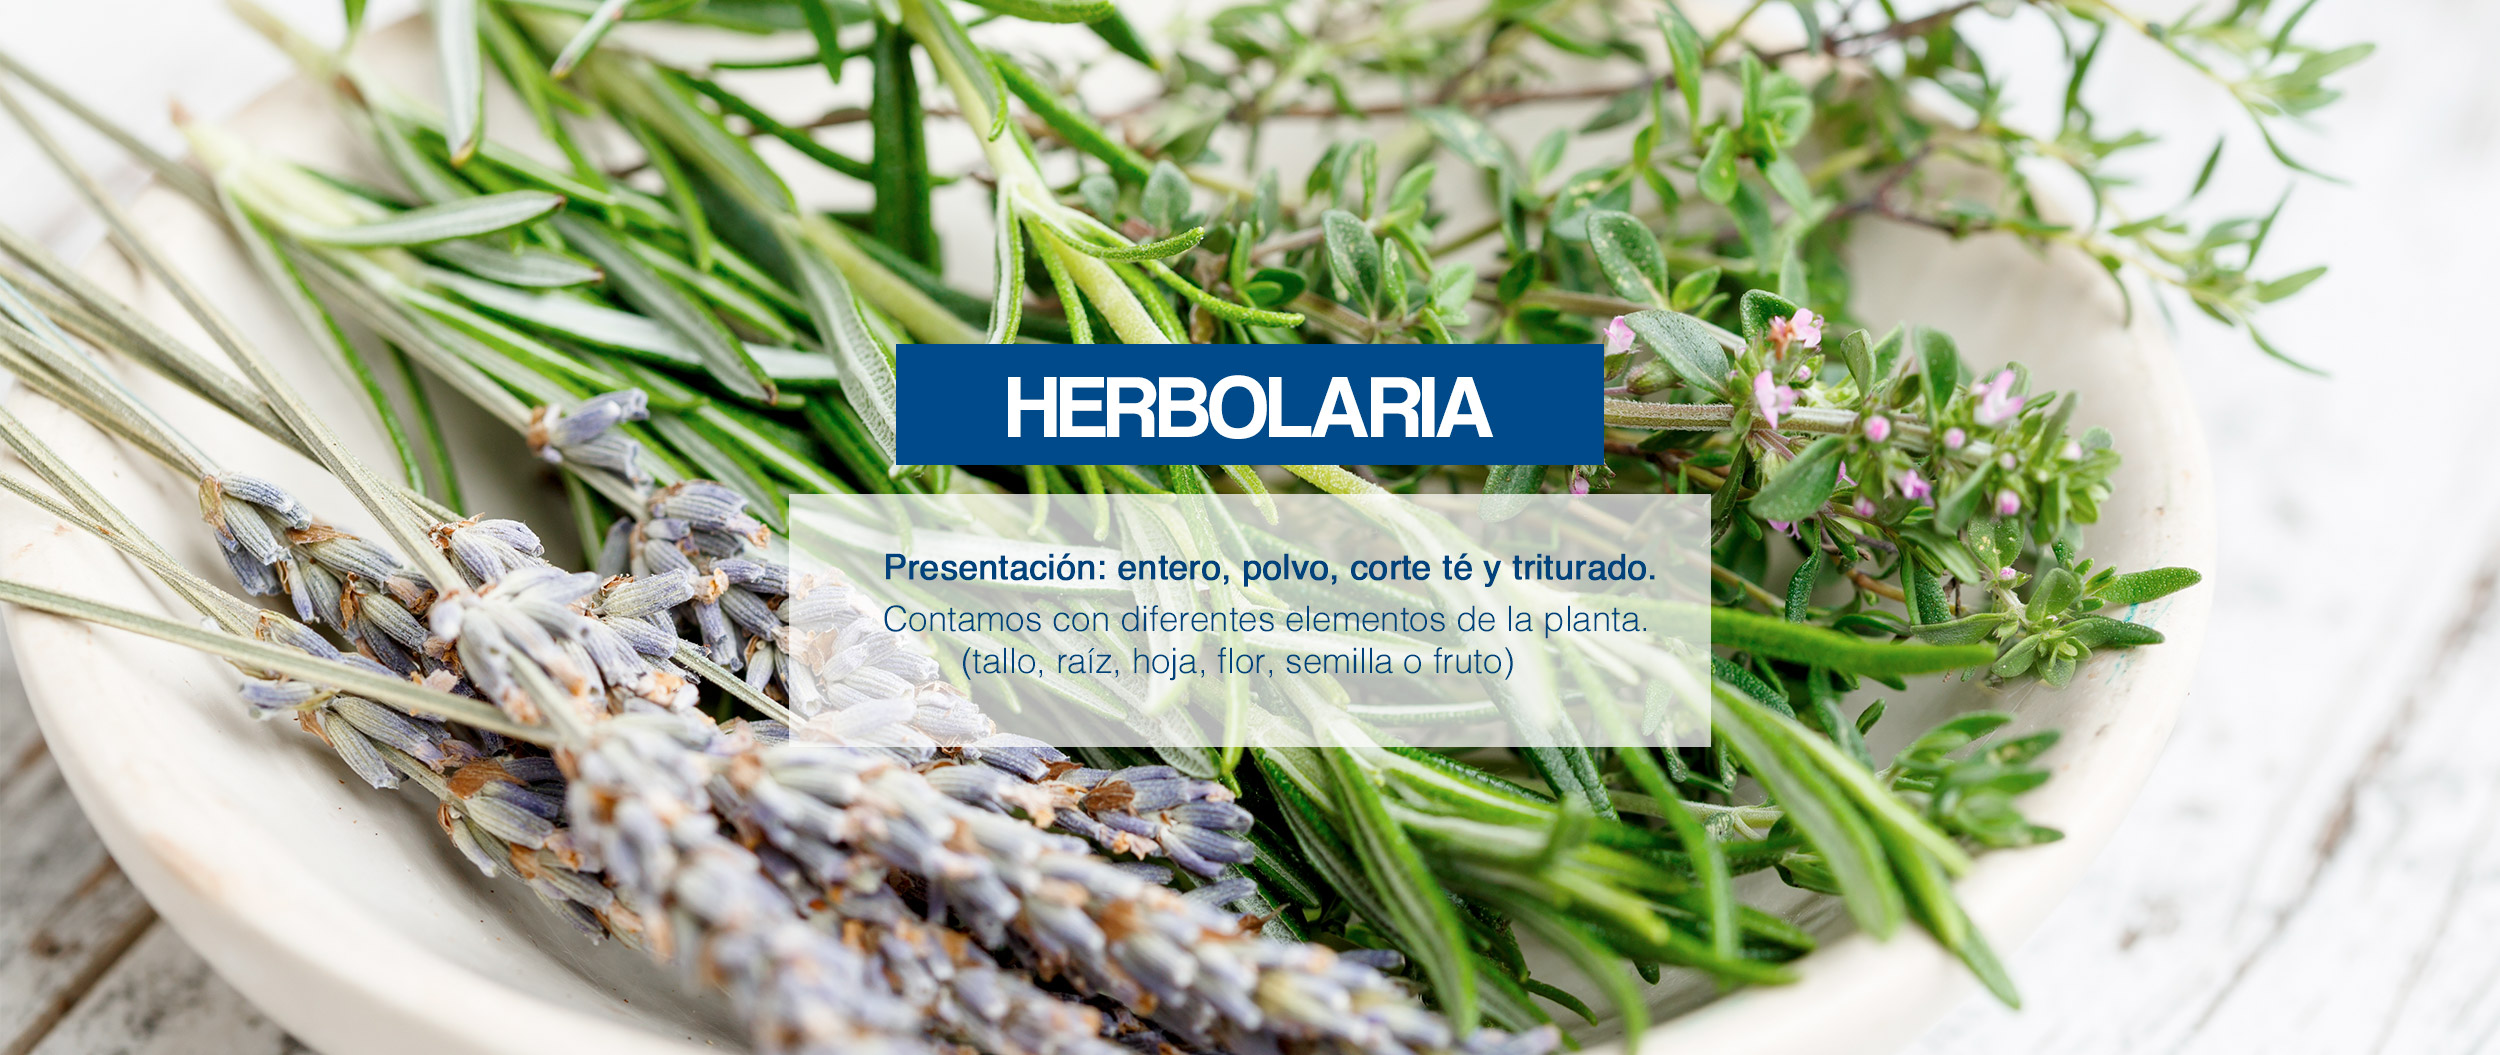 herbolaria-banner